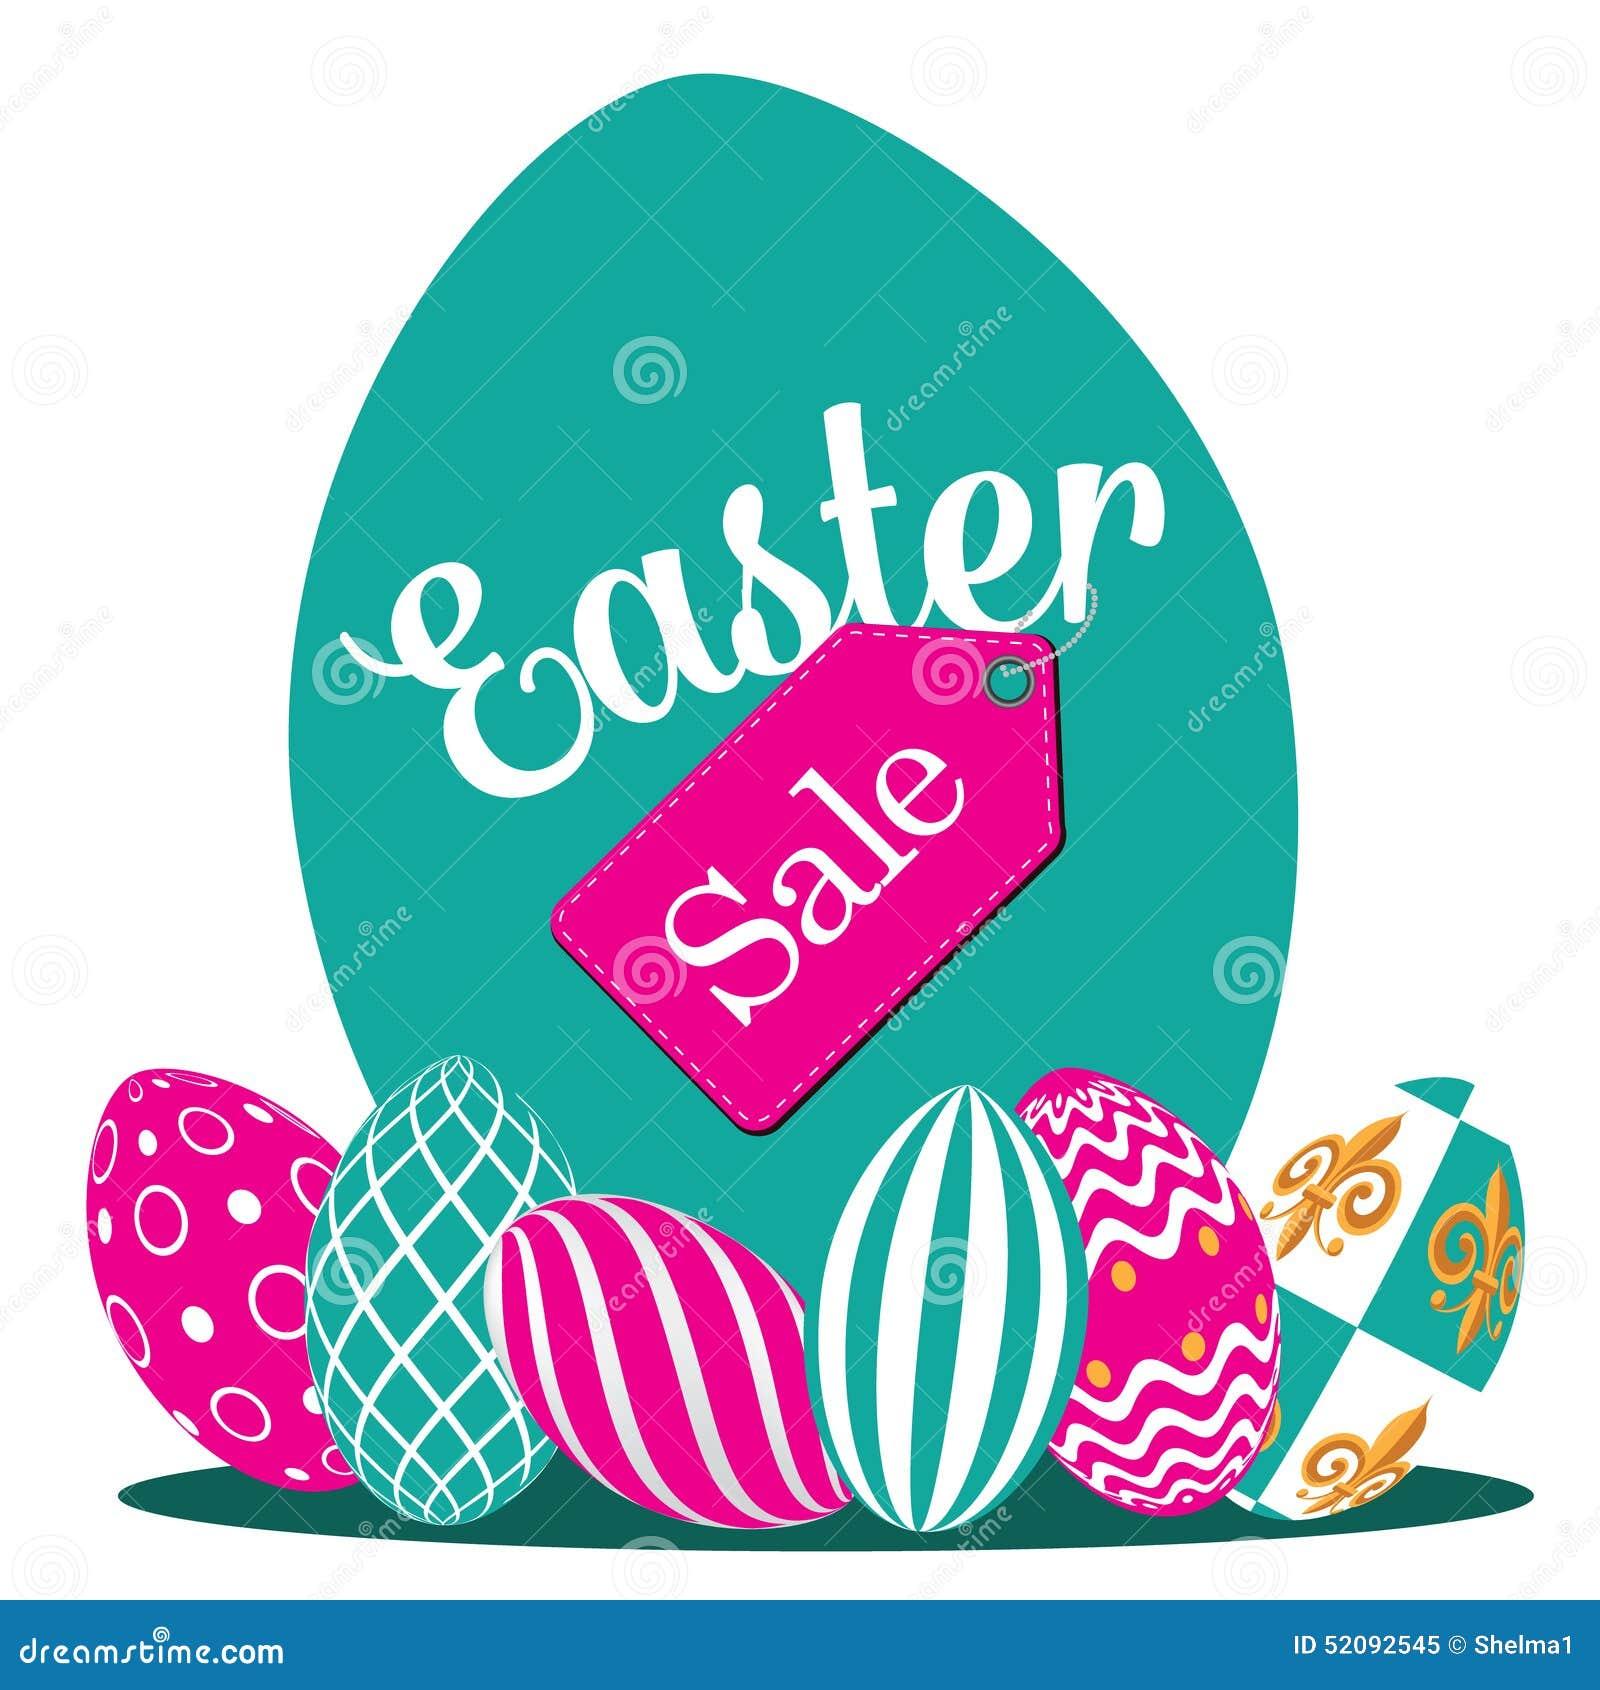 Poster design eps - Easter Egg Hunt Background Flat Design Eps 10 Vector Royalty Free Stock Photo